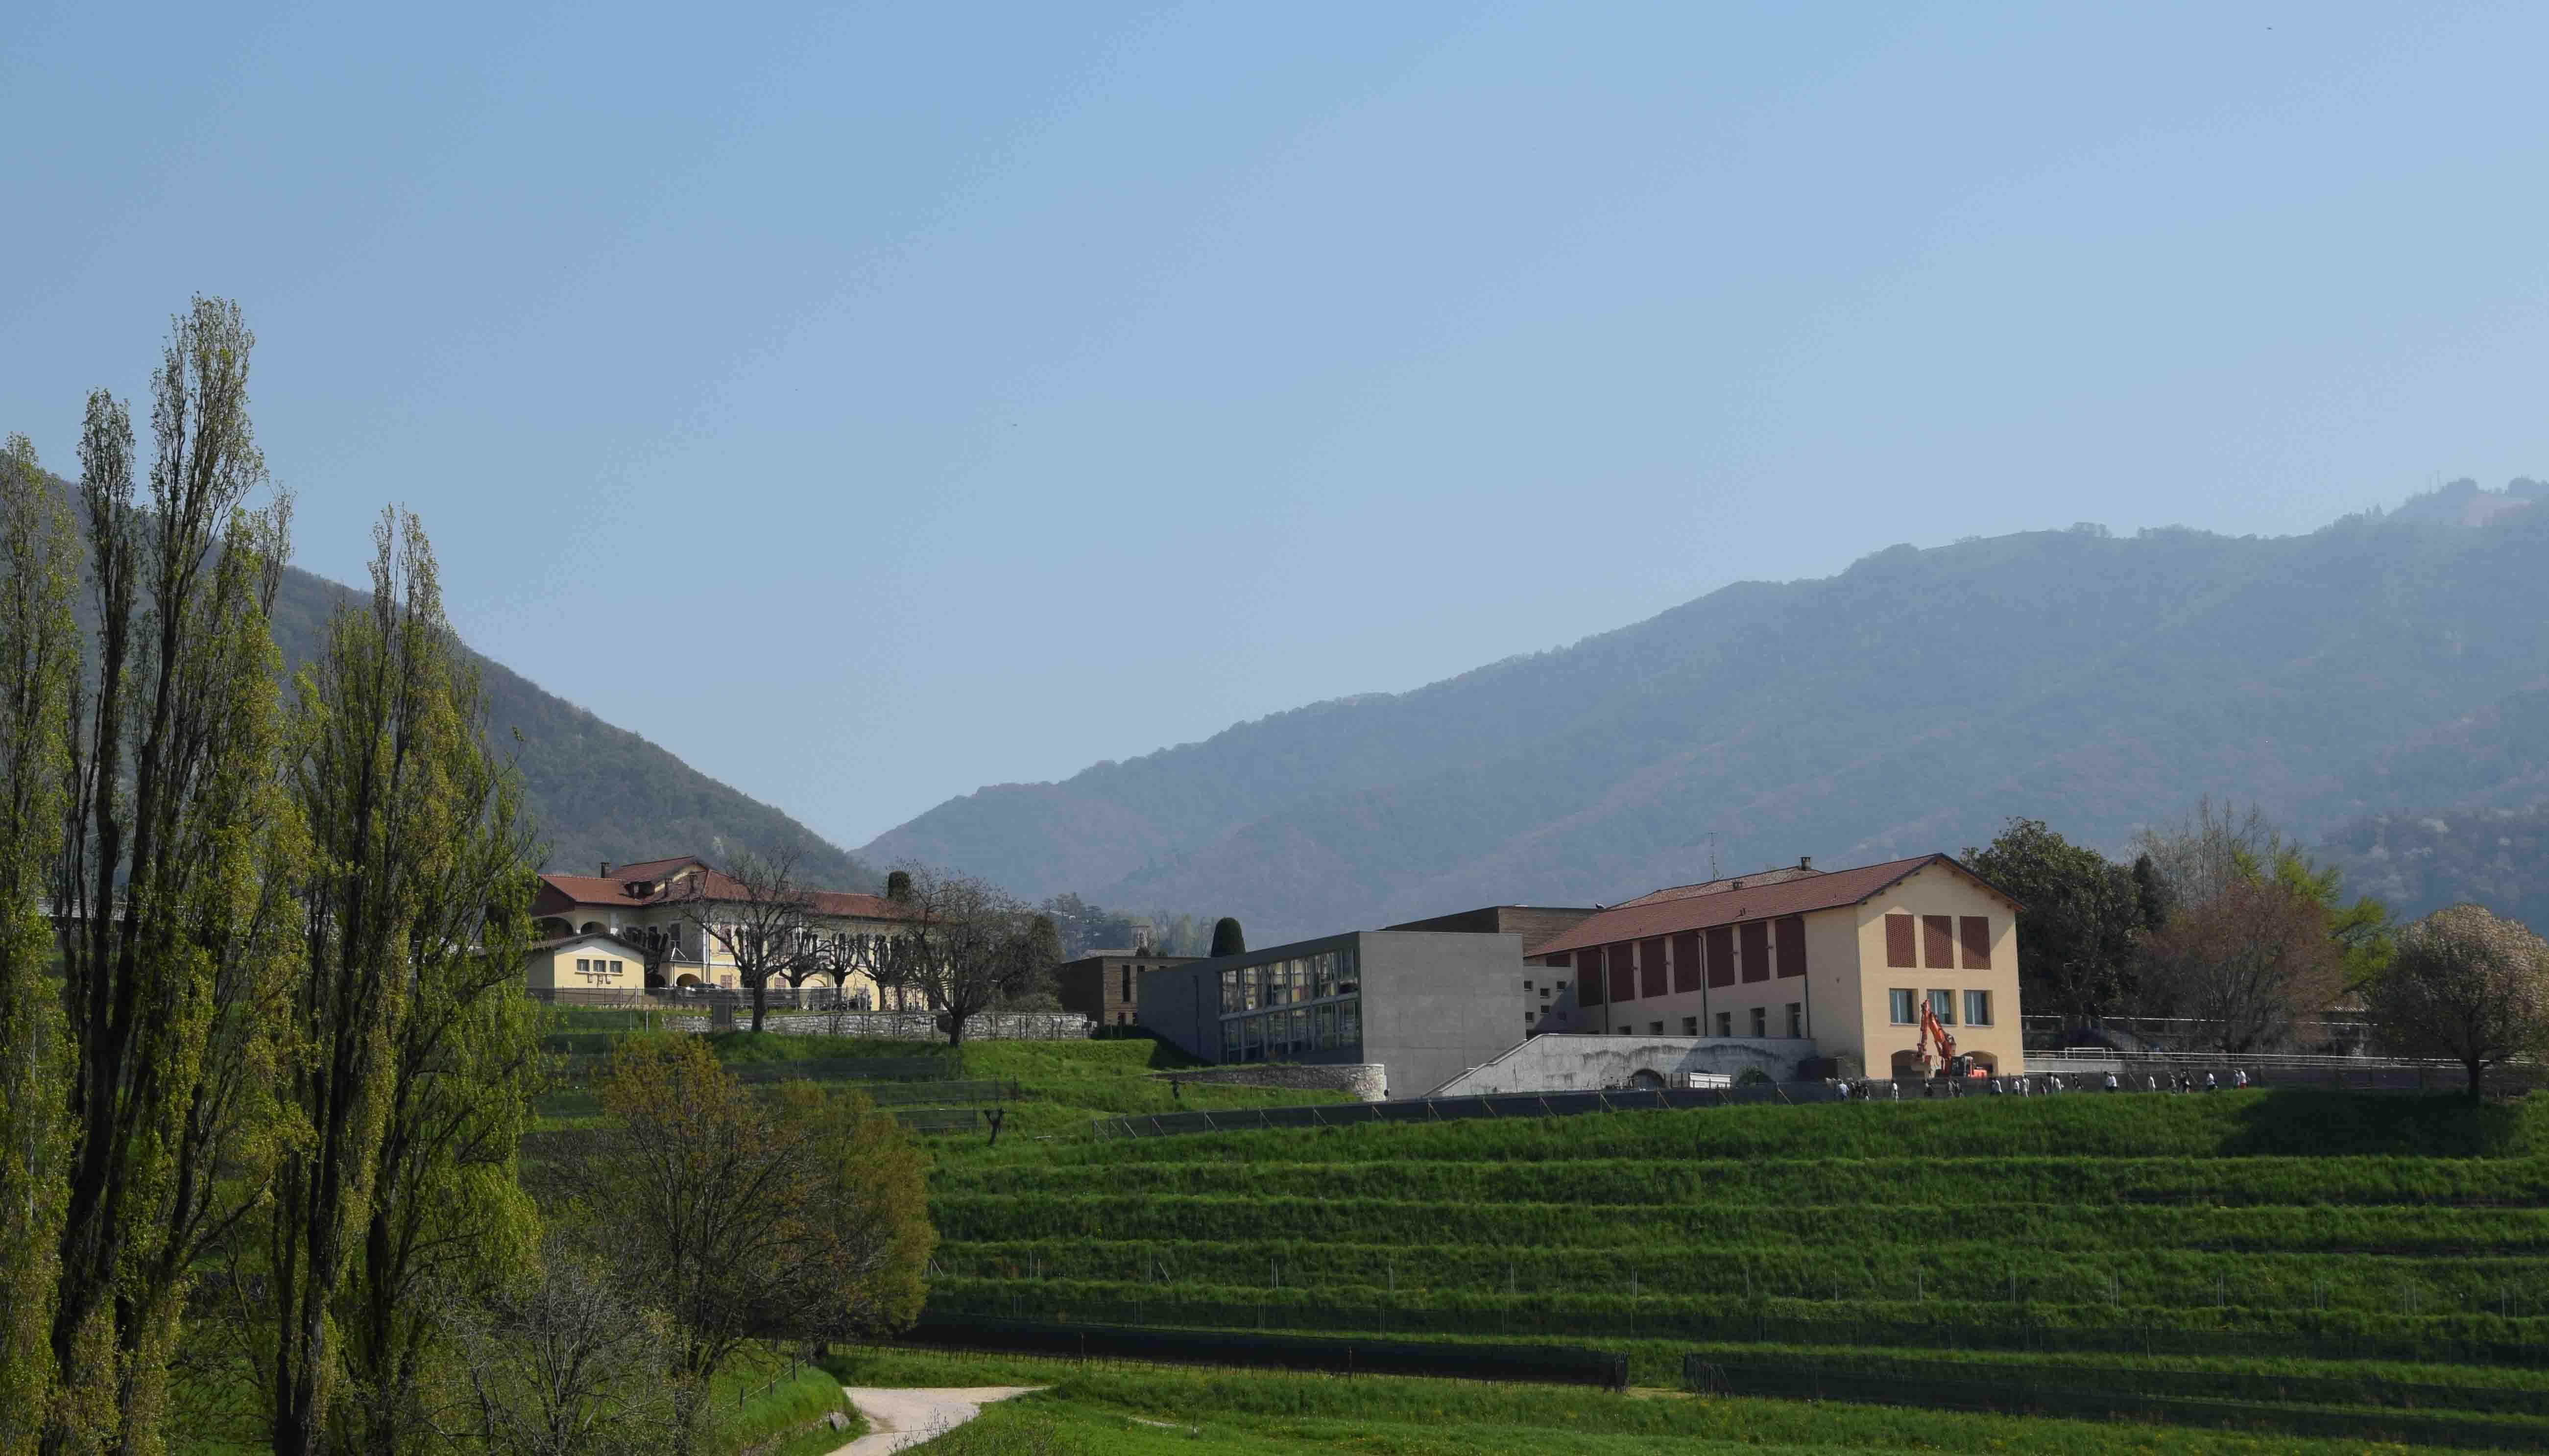 Istituto Agrario Cantonale Mezzana